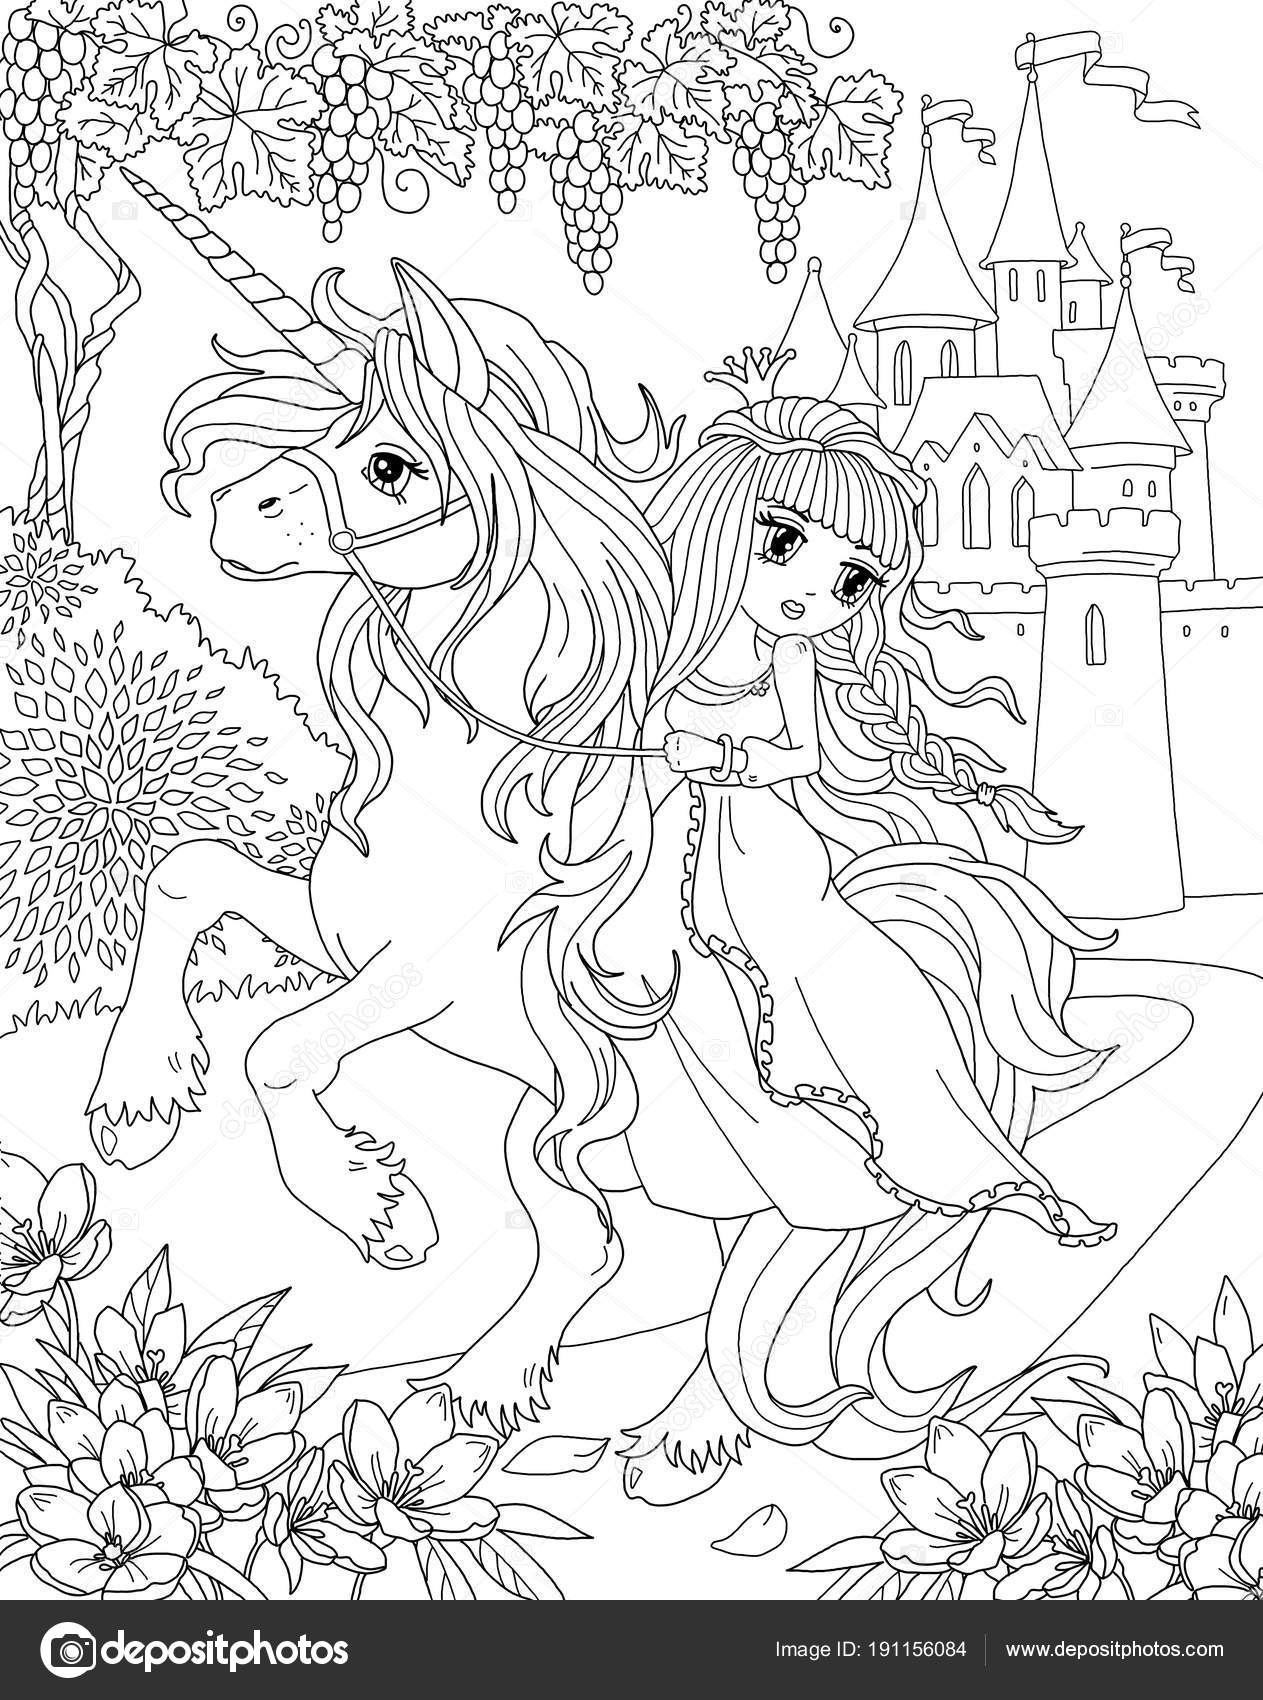 Boyama Sayfası Unicorn Prenses Stok Foto Larisakuzovkova 191156084